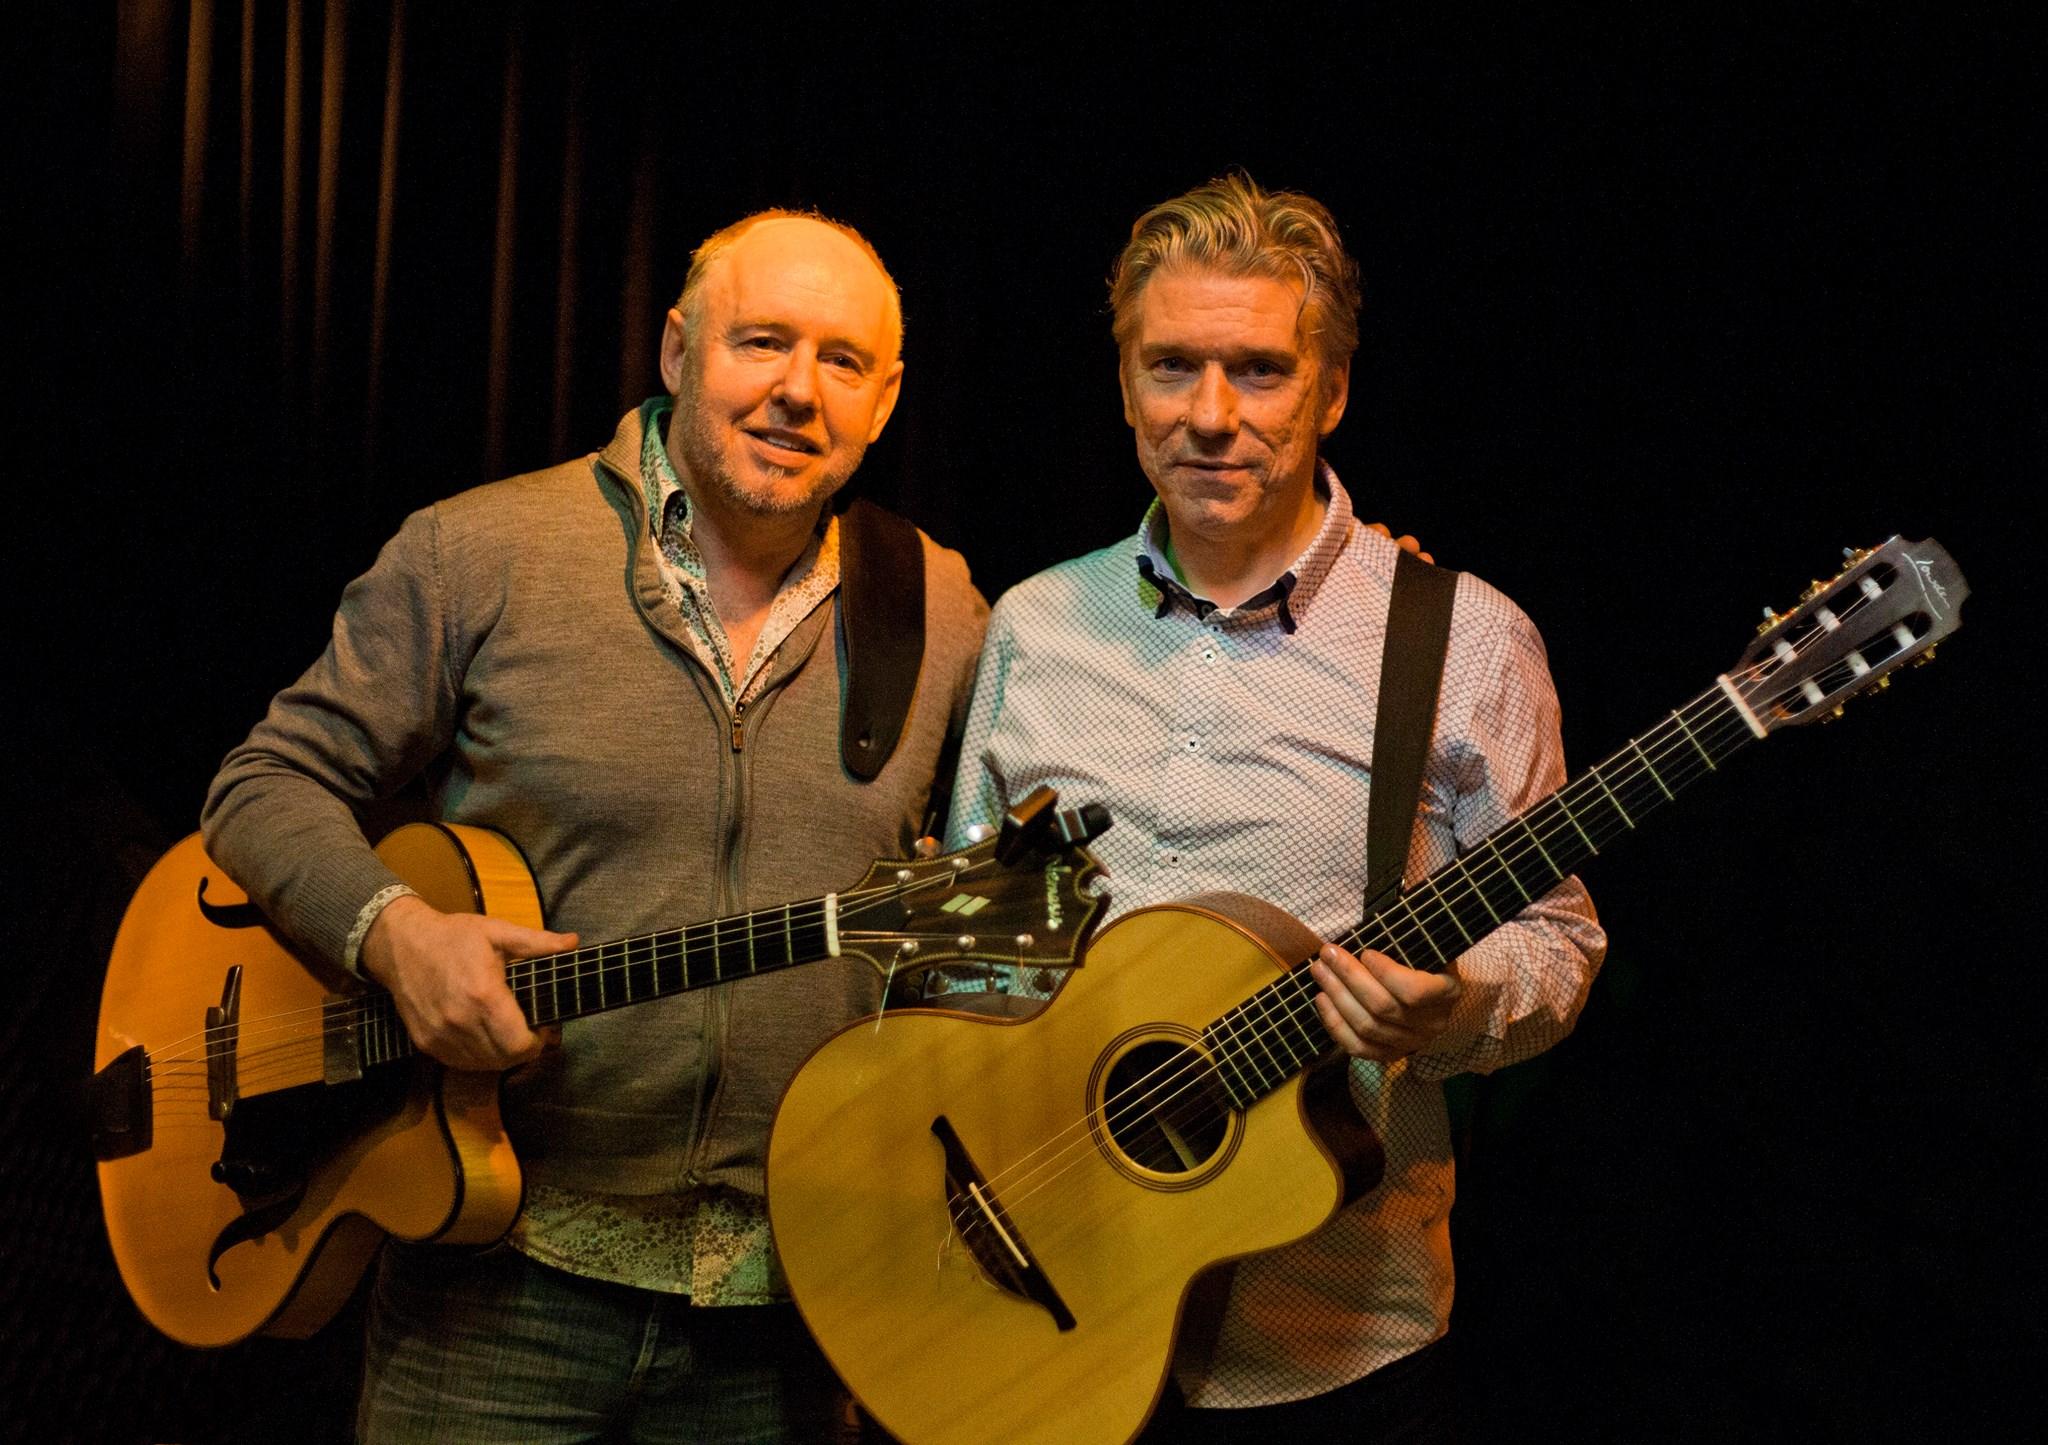 Guitar duo Hugh Buckley and Nigel Clark